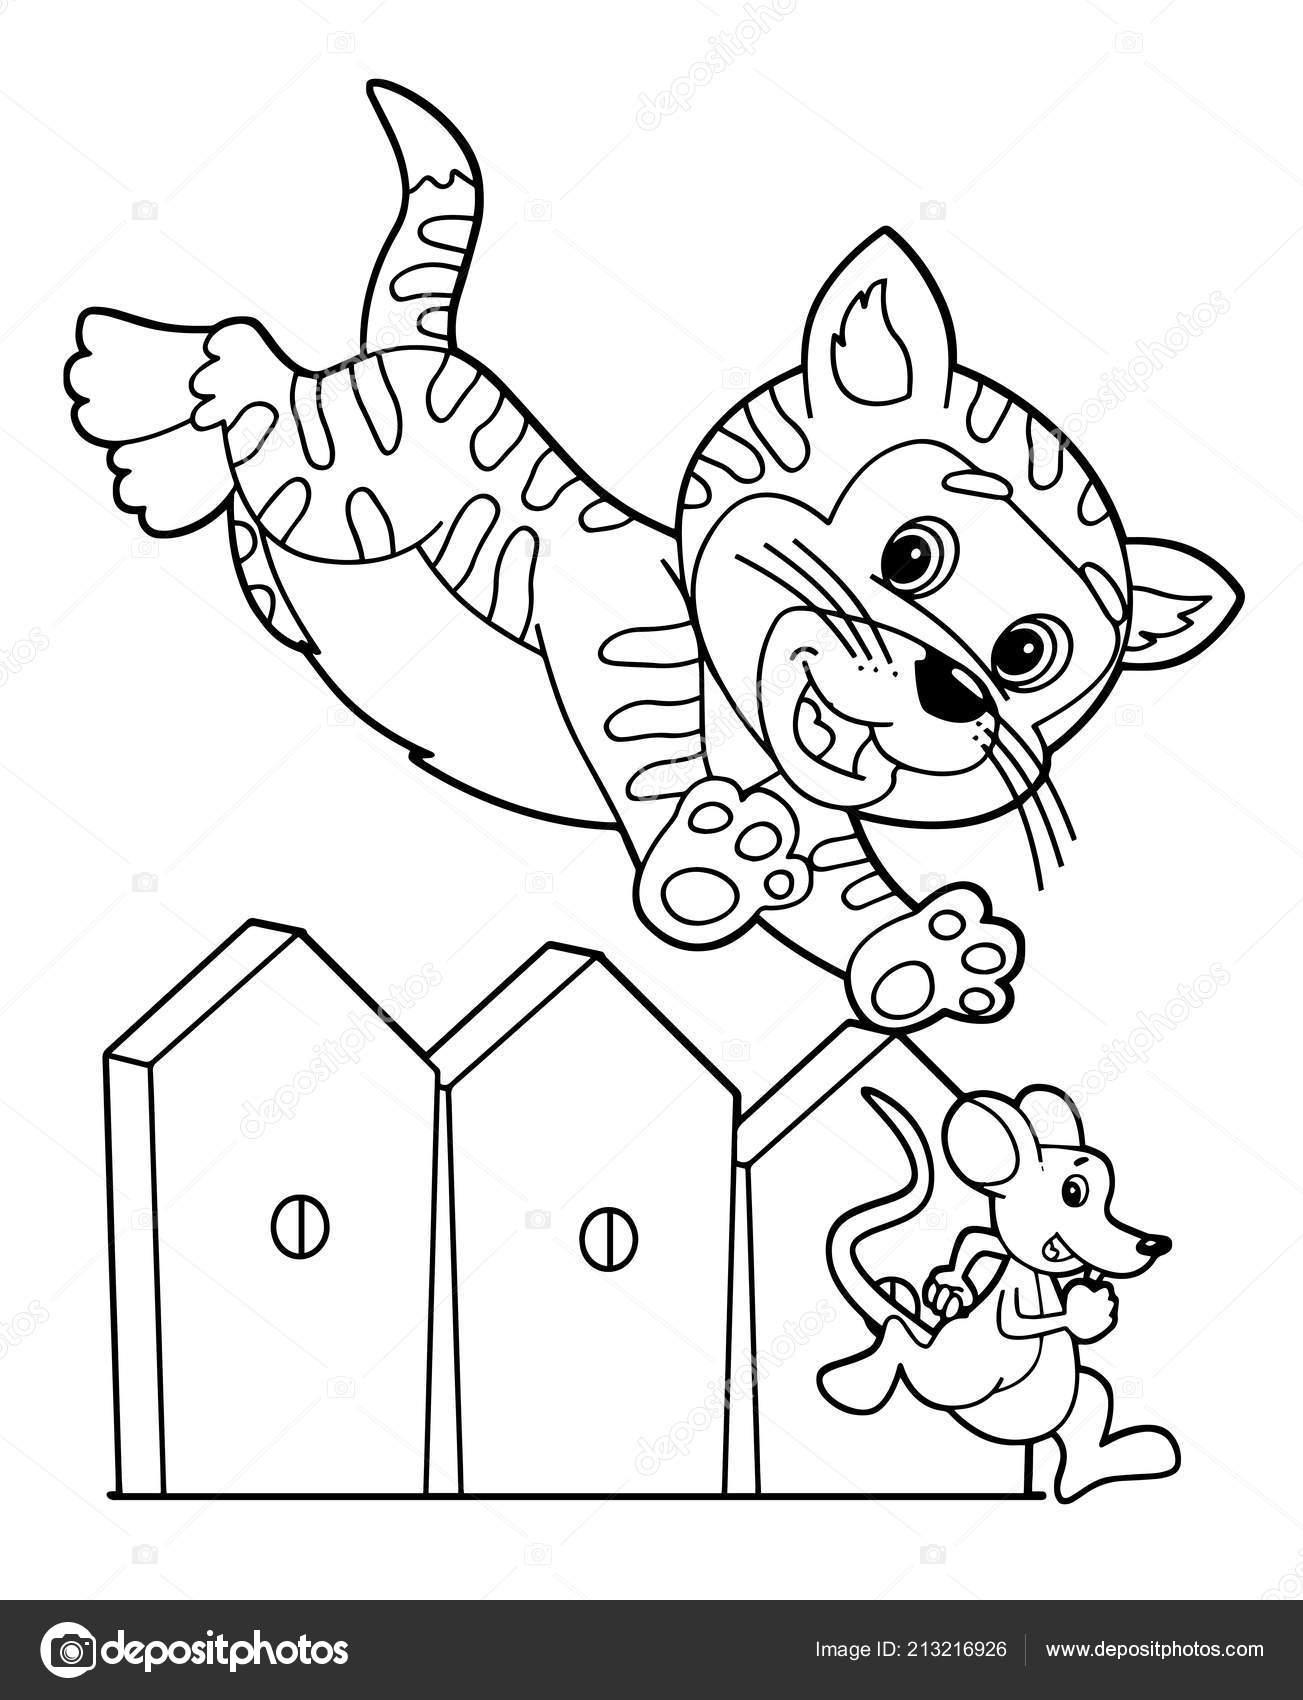 Cartoon Scene Happy Cat Jumping Wooden Fence Chasing Mouse White Stock Vector C Illustrator Hft 213216926